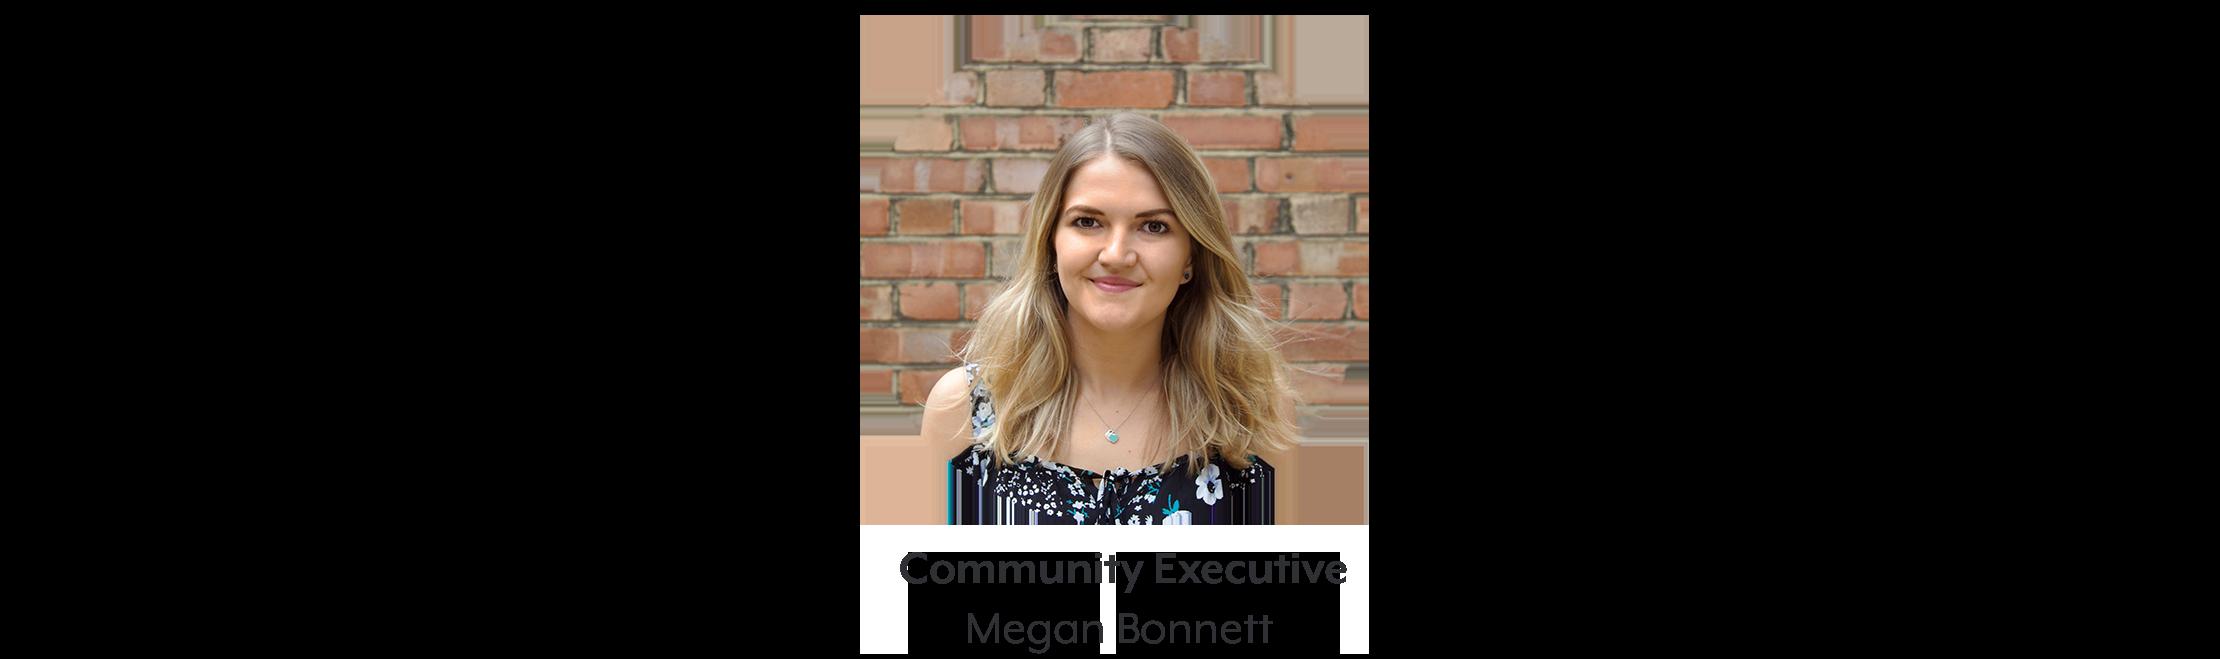 image of author 'Megan Bonnett'